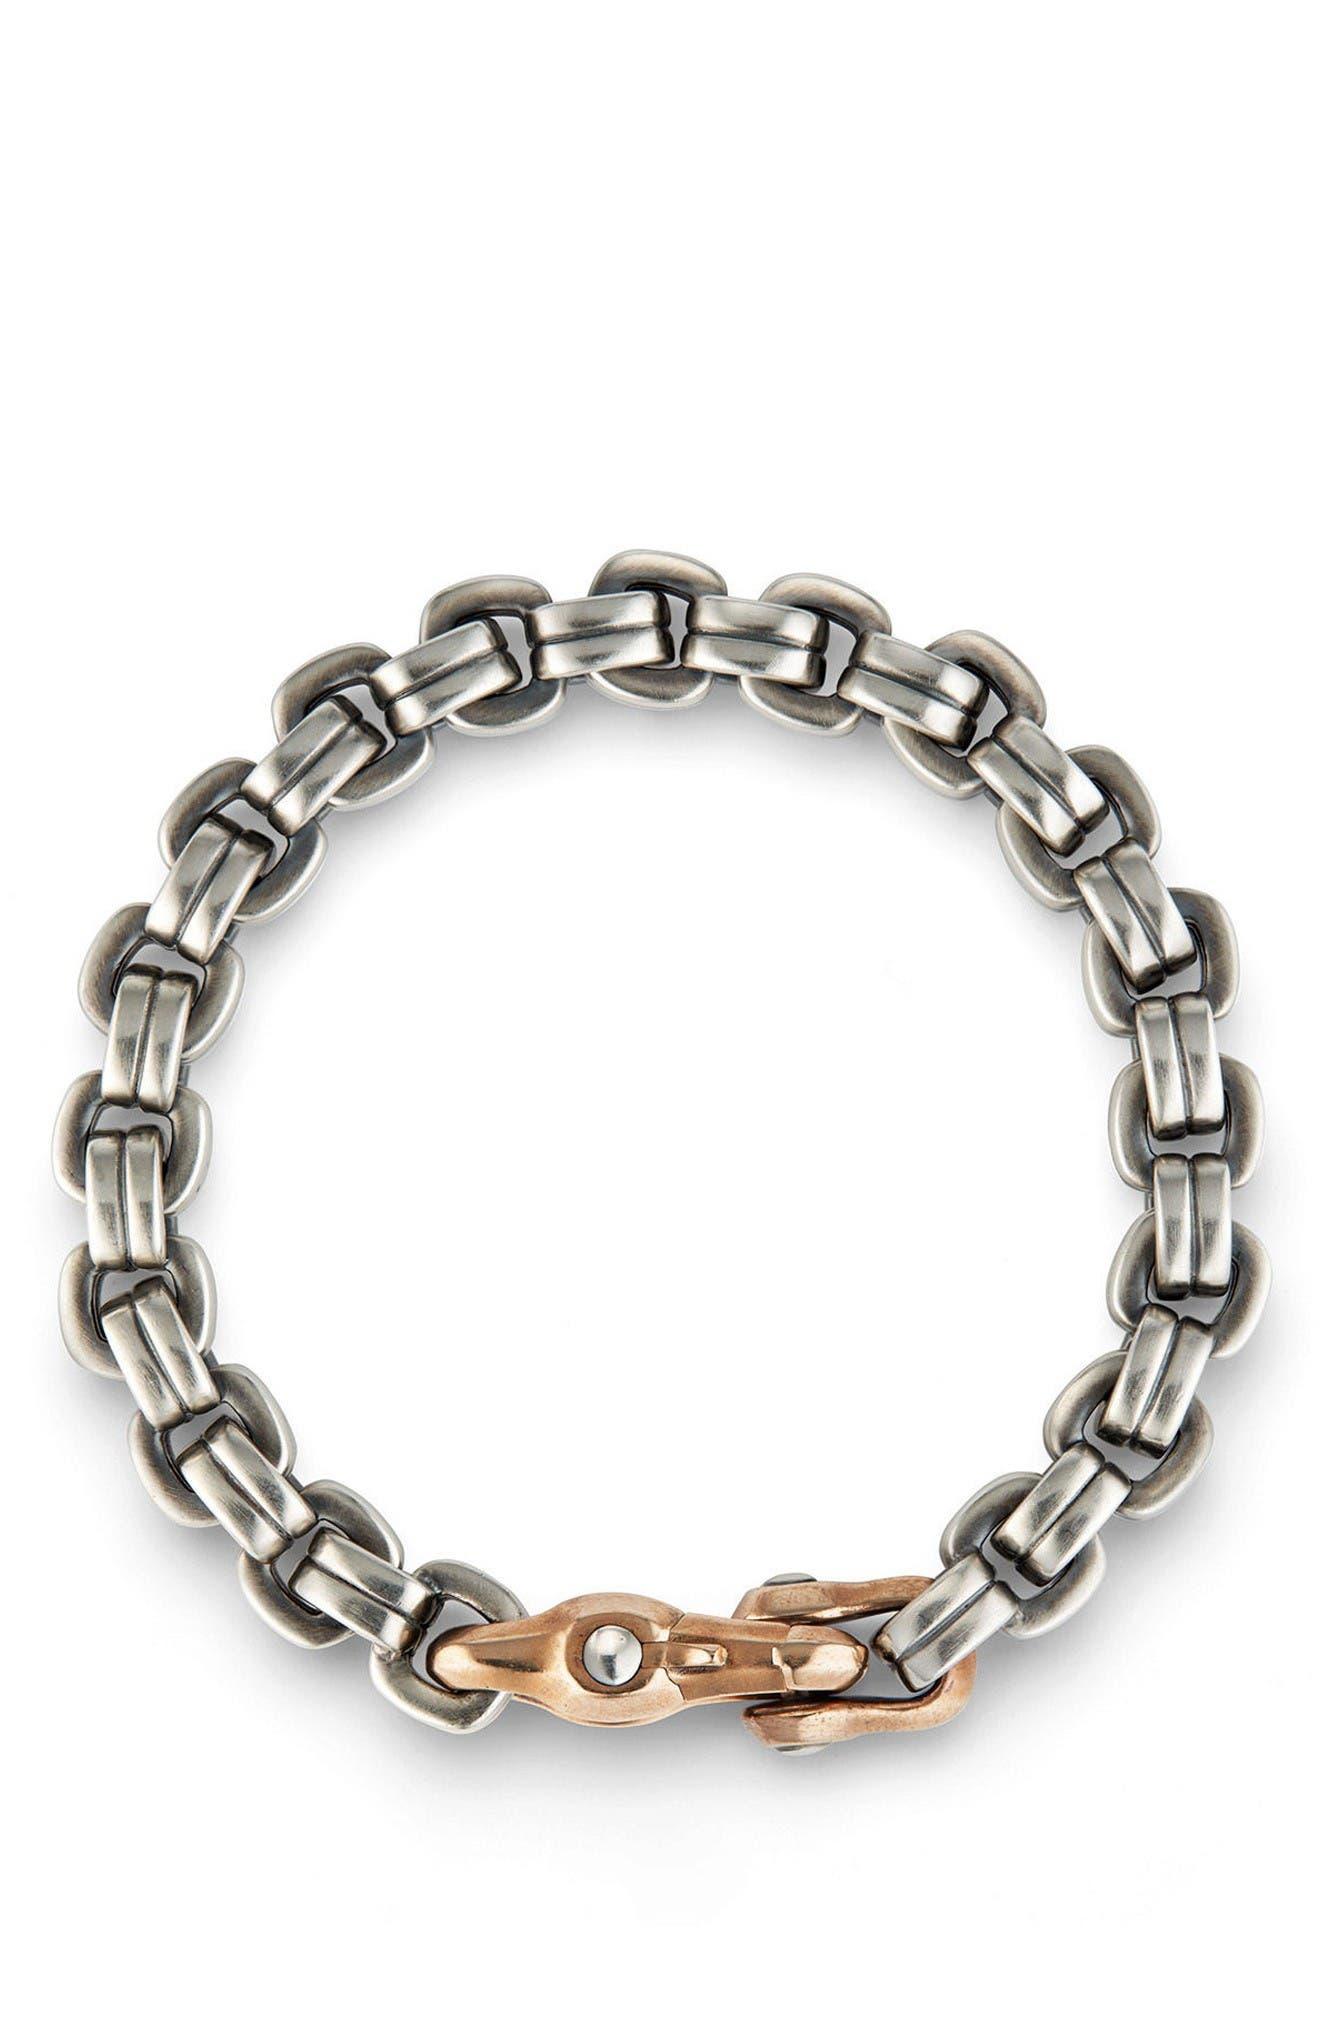 Anvil Chain Bracelet,                             Alternate thumbnail 2, color,                             Silver/ Bronze